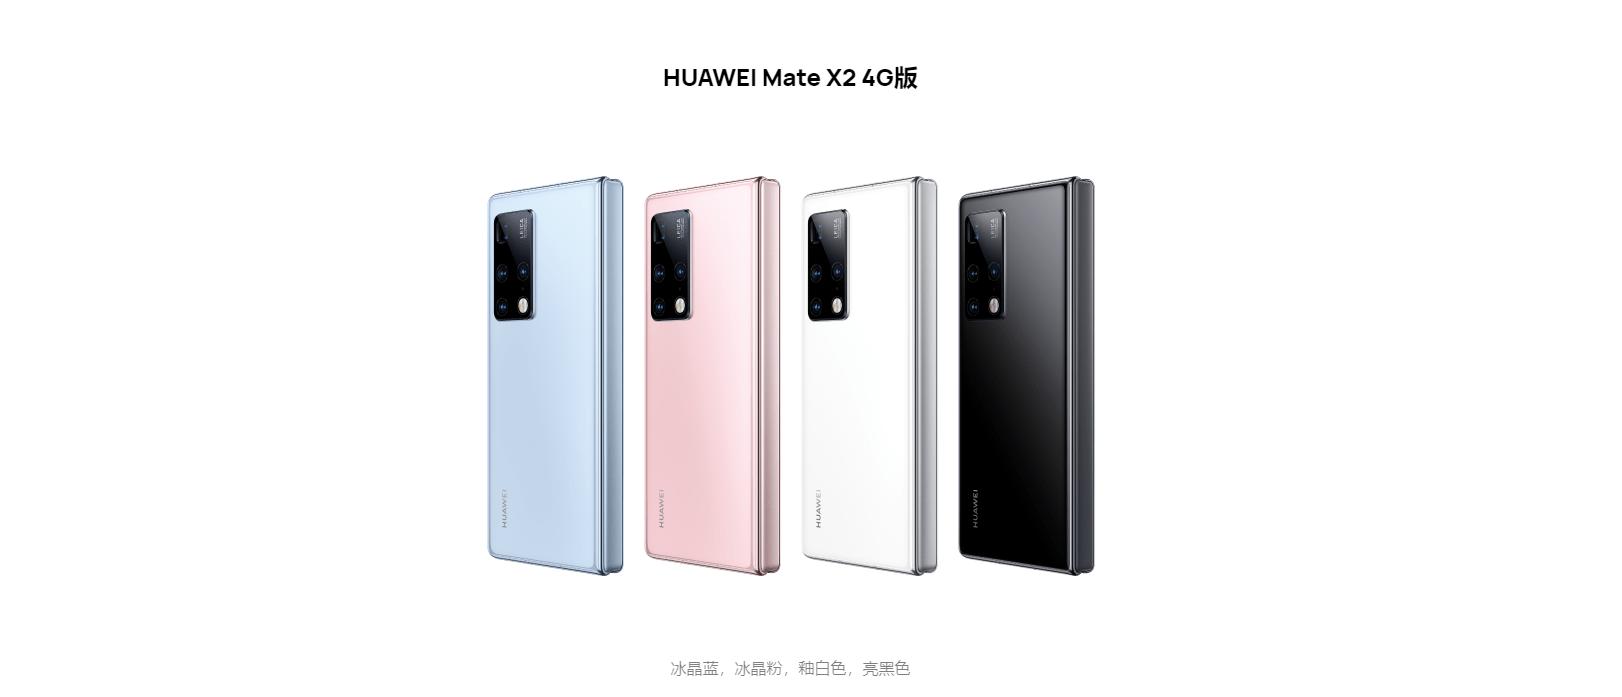 HUAWEIが5G非対応のHUAWEI Mate 40 Pro 4G版、Mate 40E 4G版、Mate X2 4G版を販売開始、米バイデン政権の制裁影響か